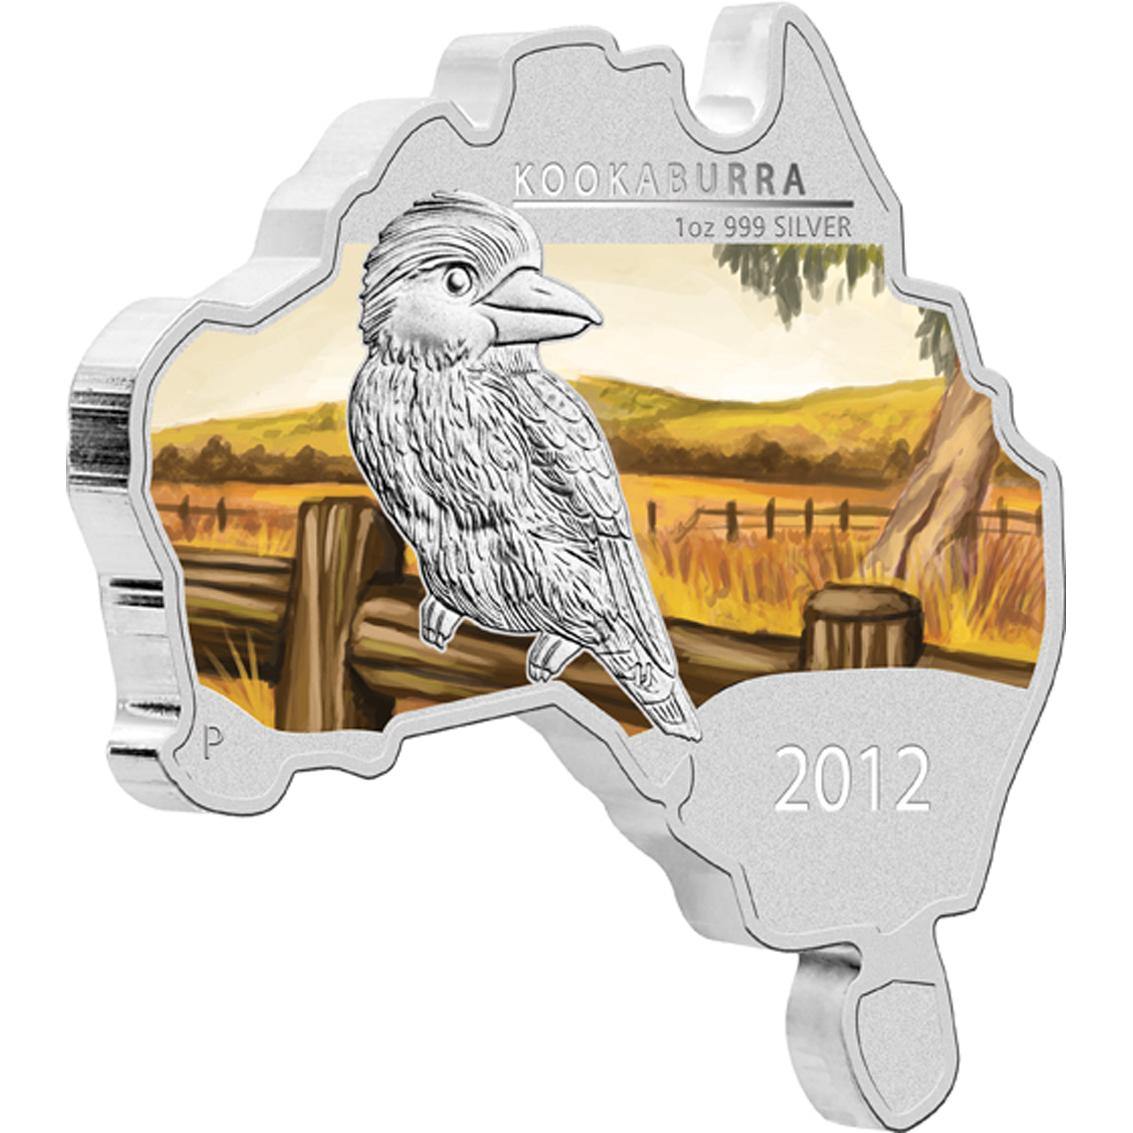 Australian kookaburra coin - photo#23